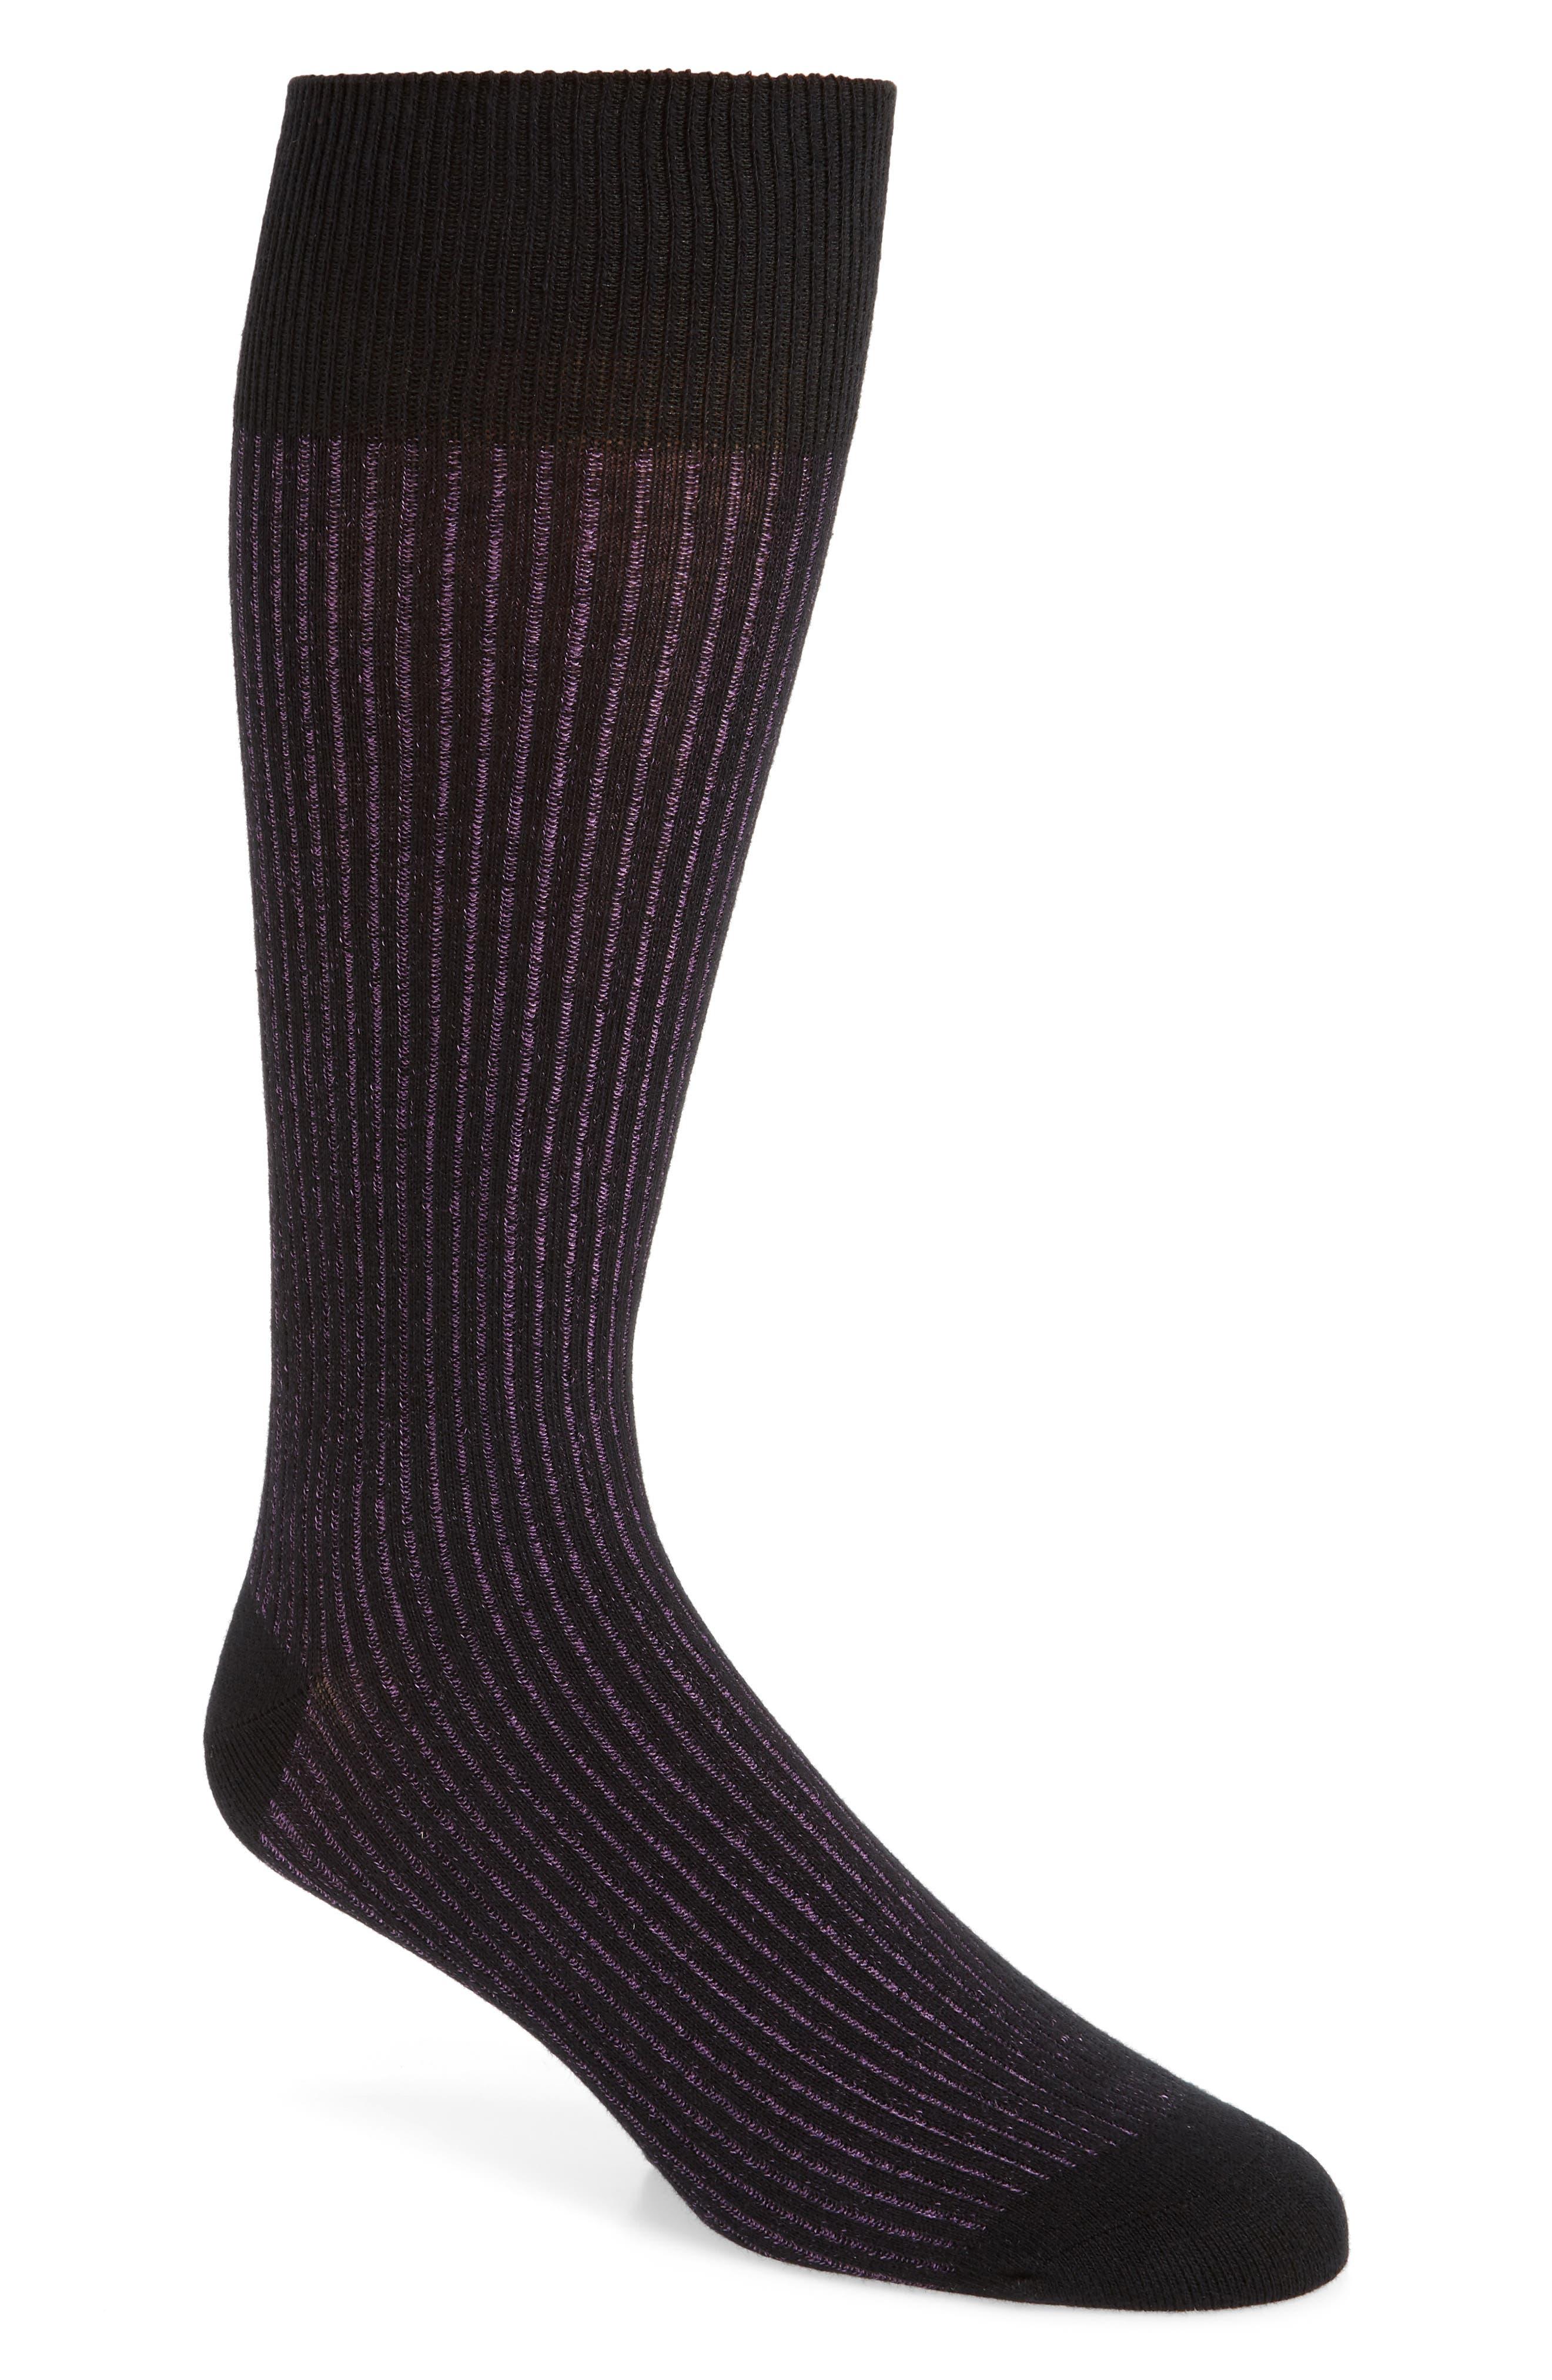 Ribbed Socks,                         Main,                         color, BLACK/ PURPLE LILY